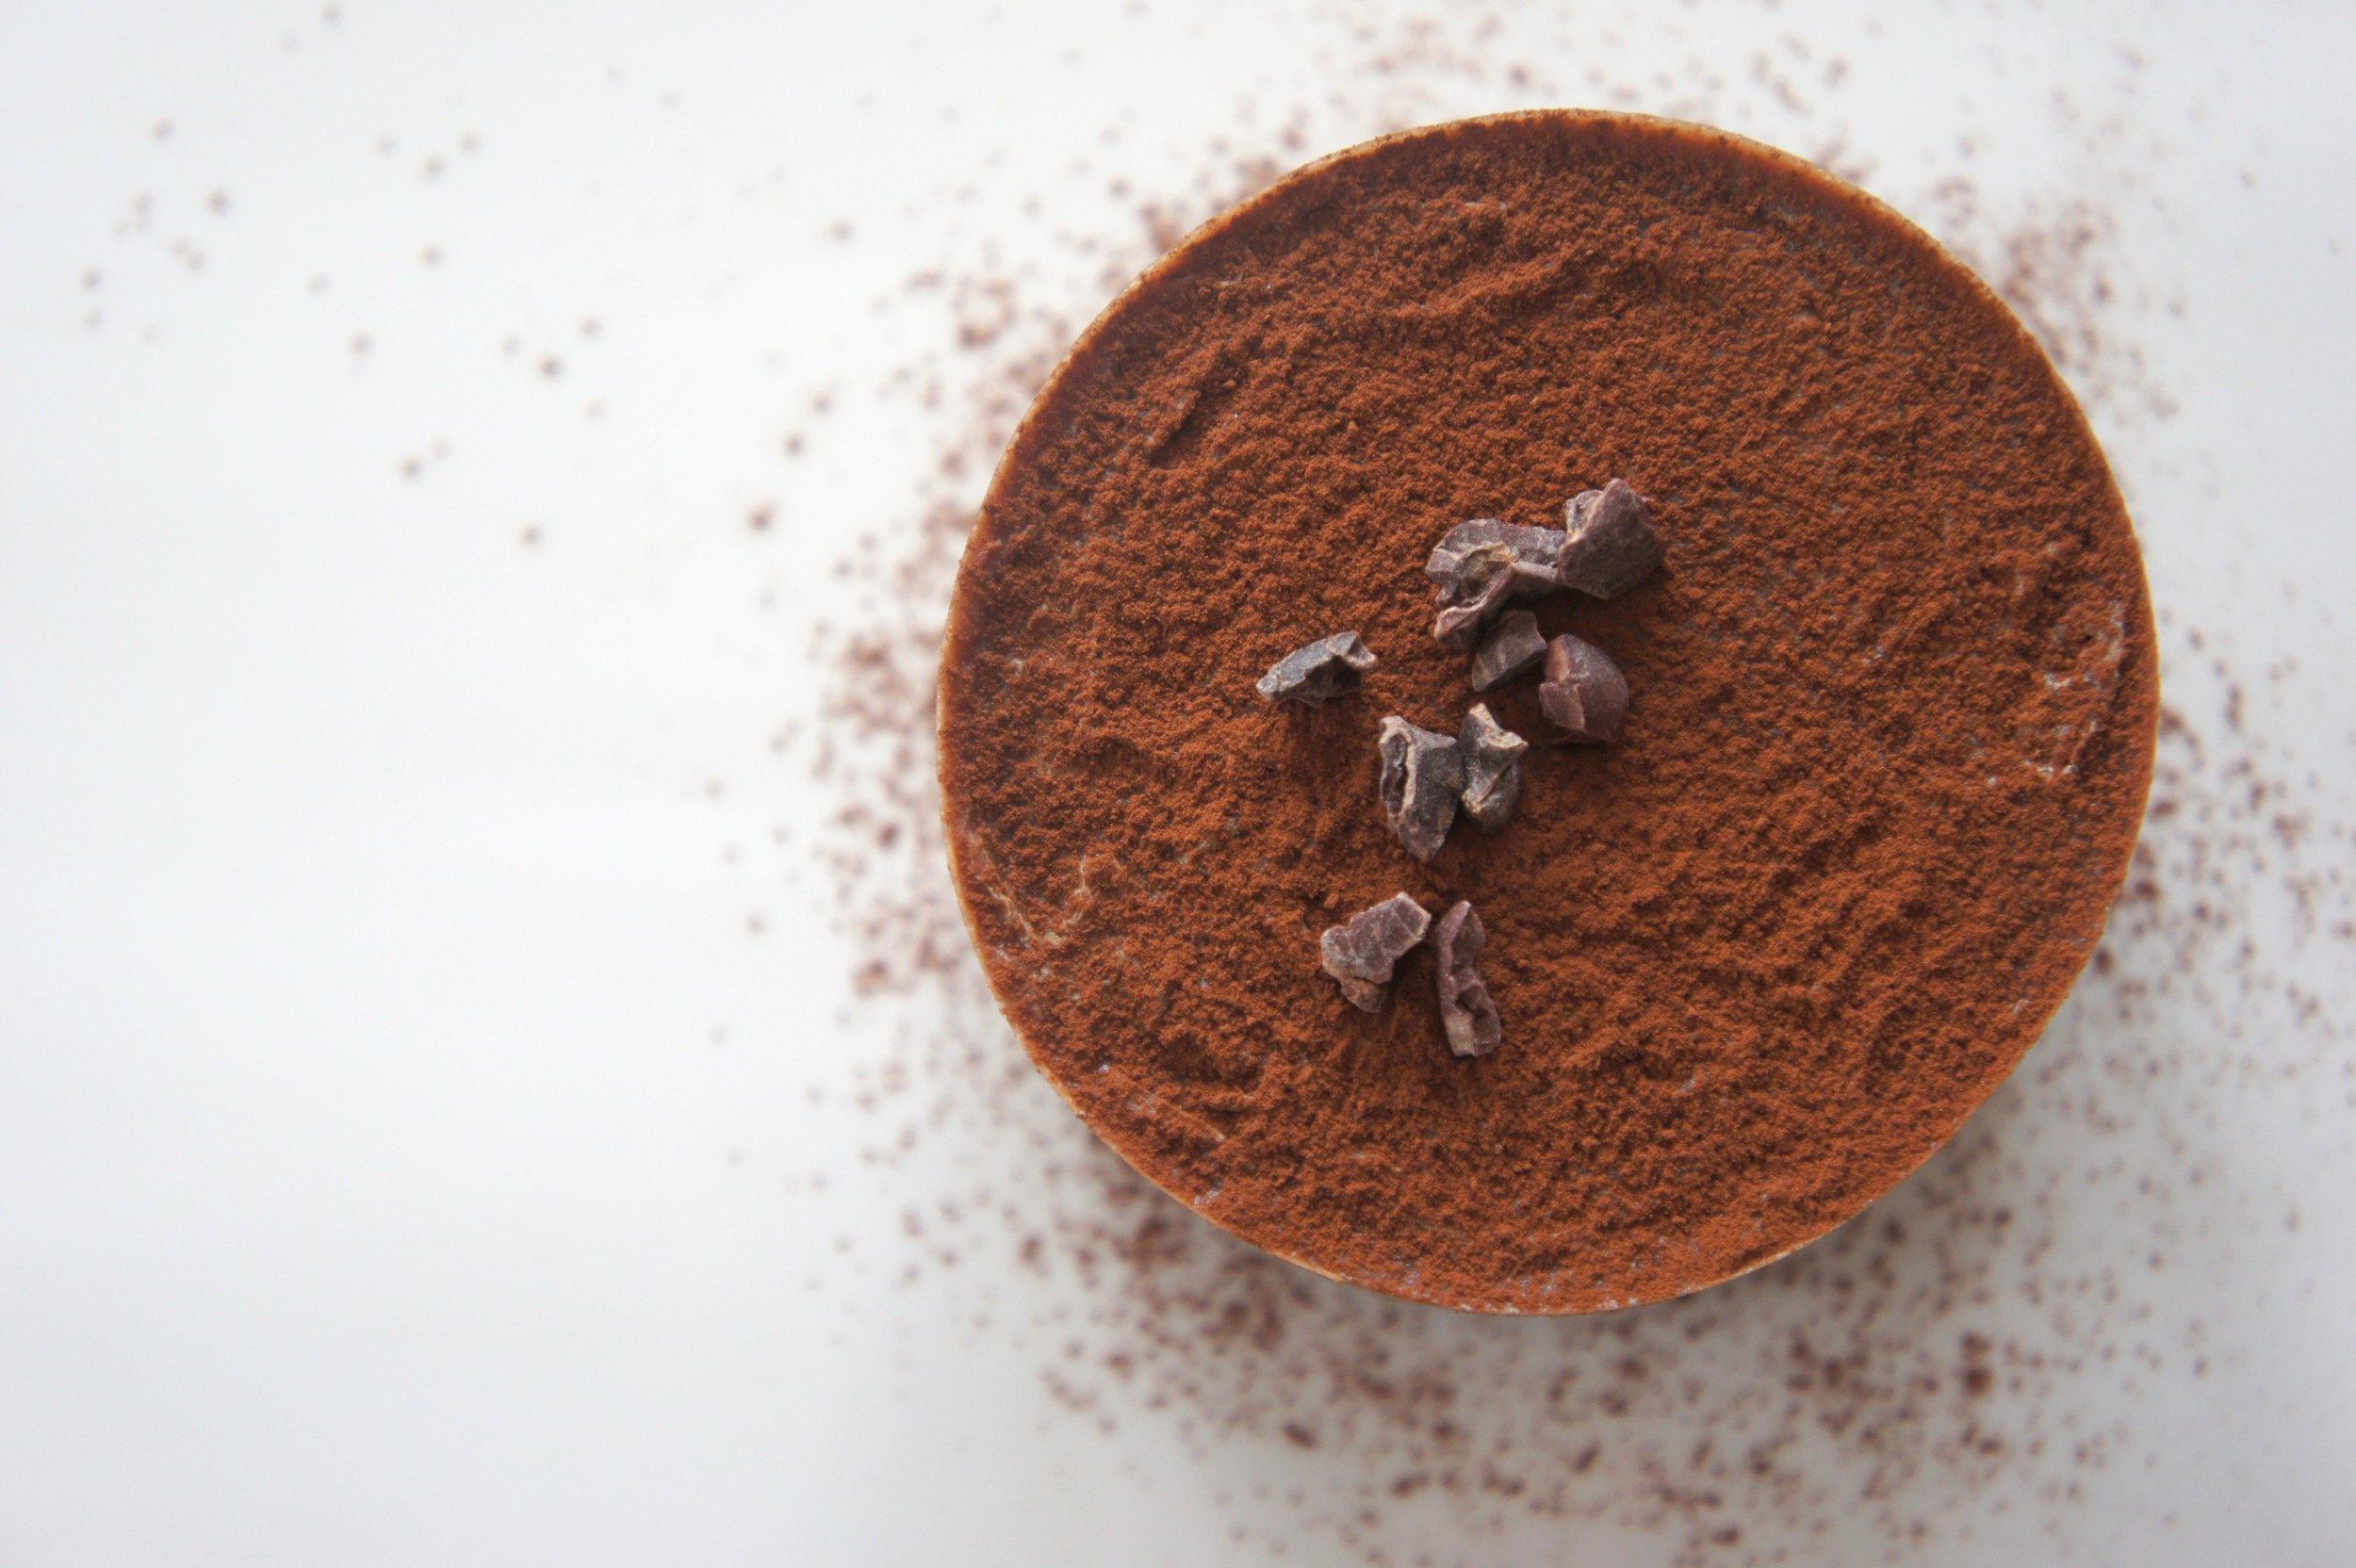 NutraStat_Hot_Chocolate.jpg